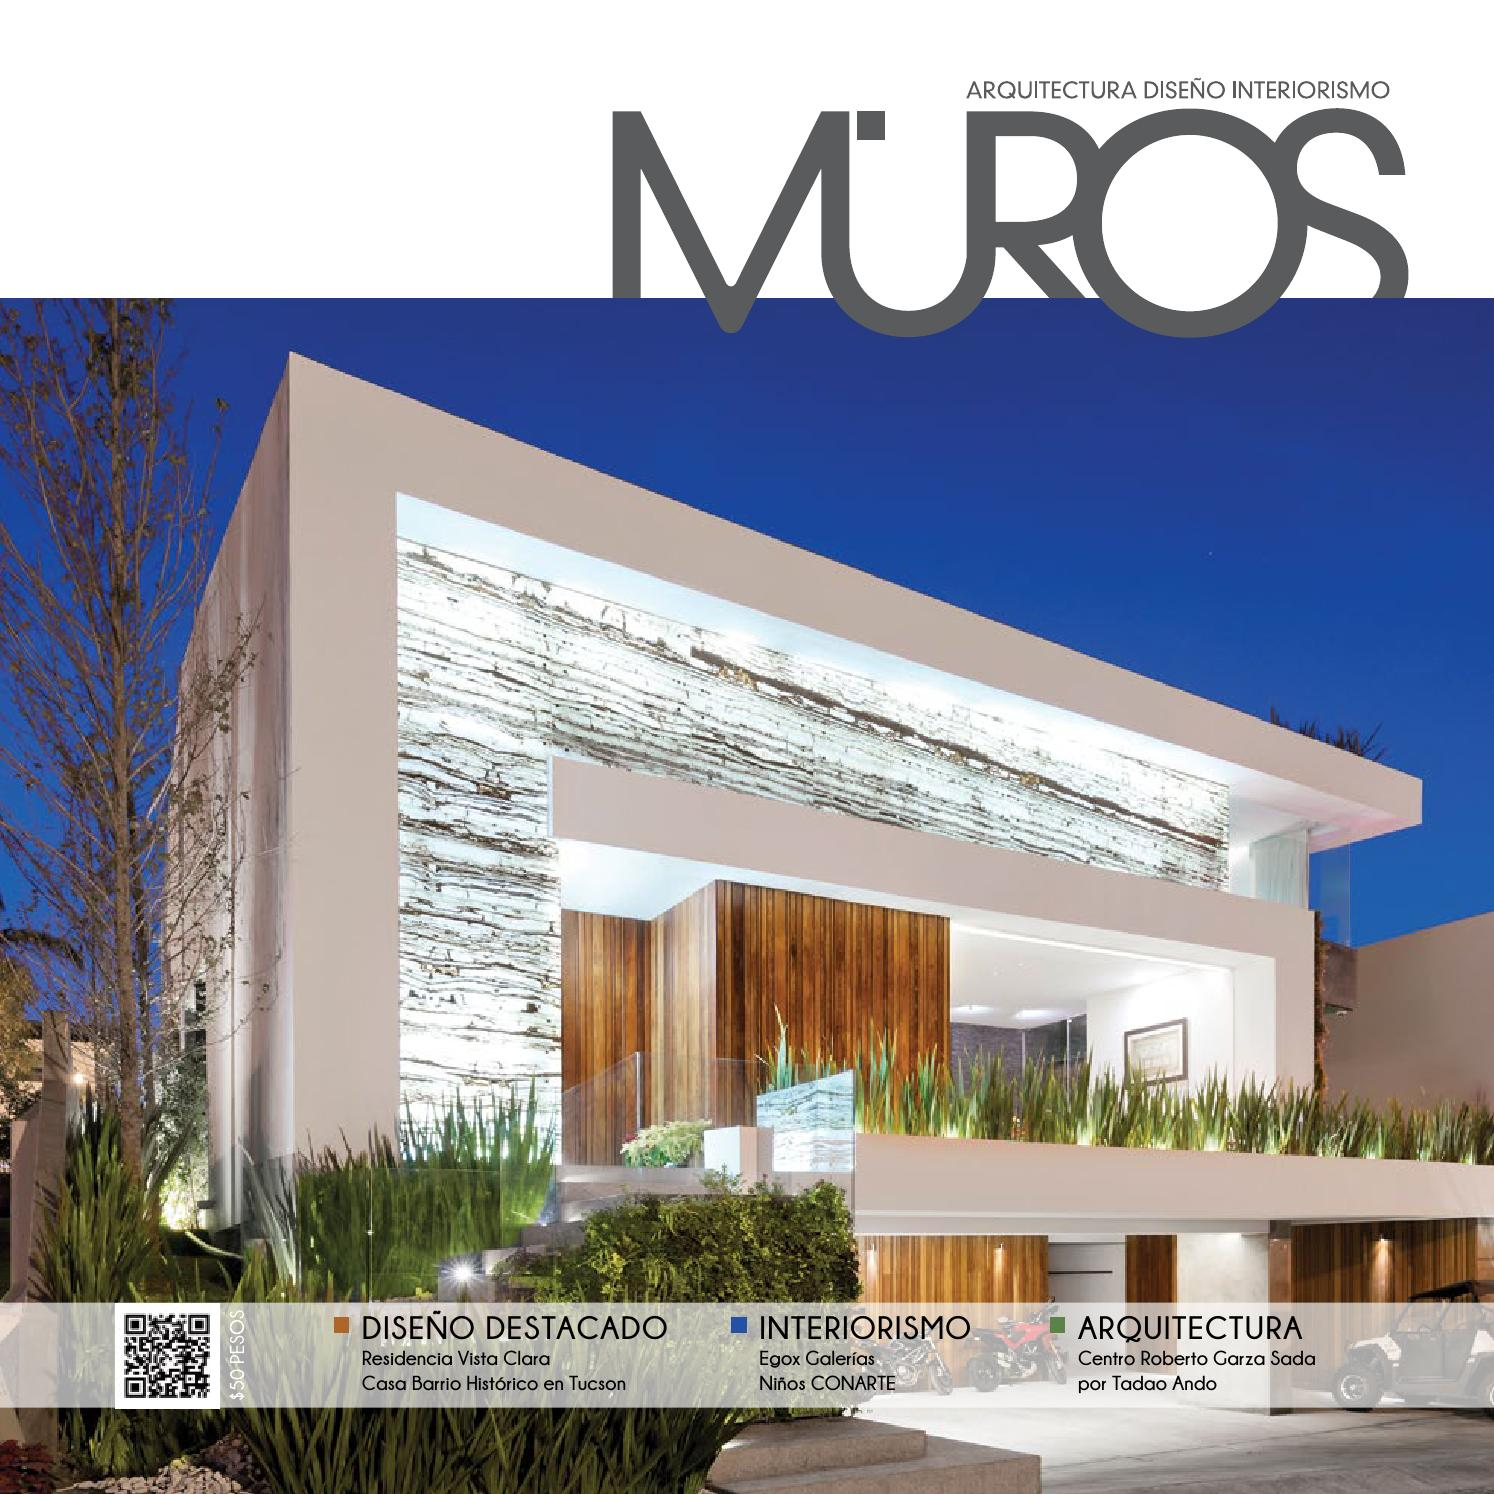 Edici n 11 revista muros arquitectura dise o Arte arquitectura y diseno definicion